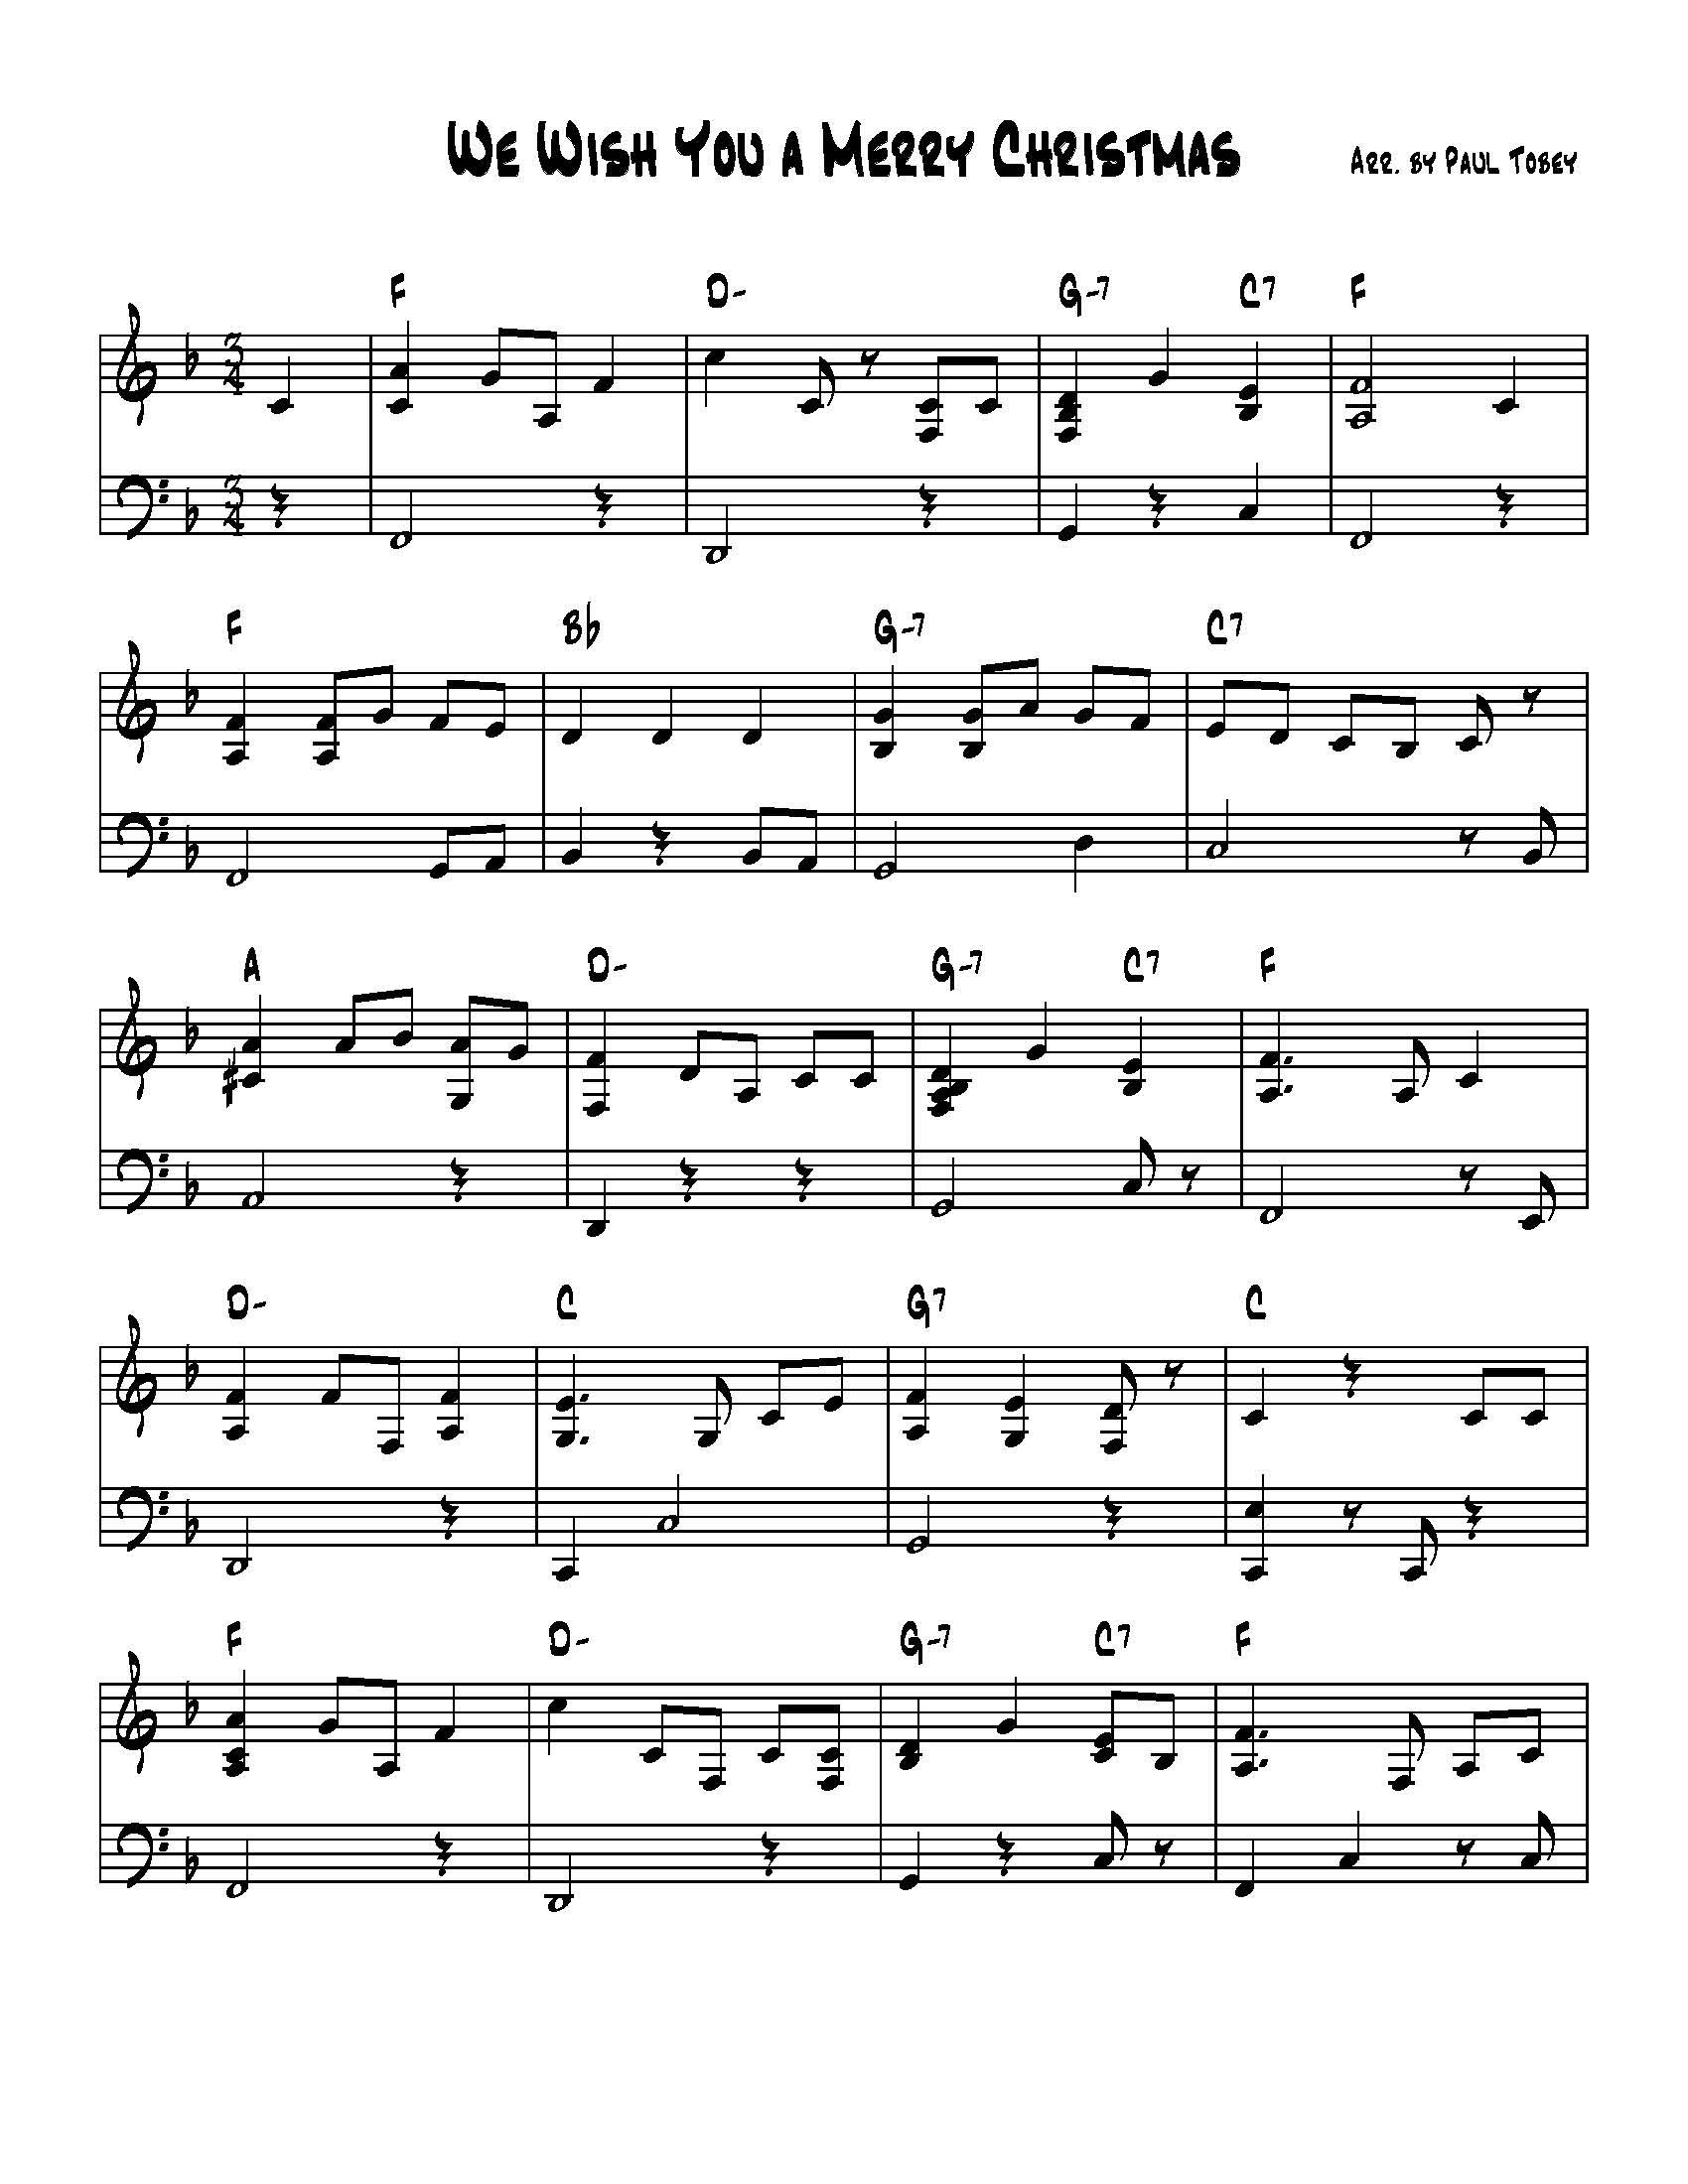 We Wish You A Merry Christmas Piano.We Wish You A Merry Christmas Sheet Music